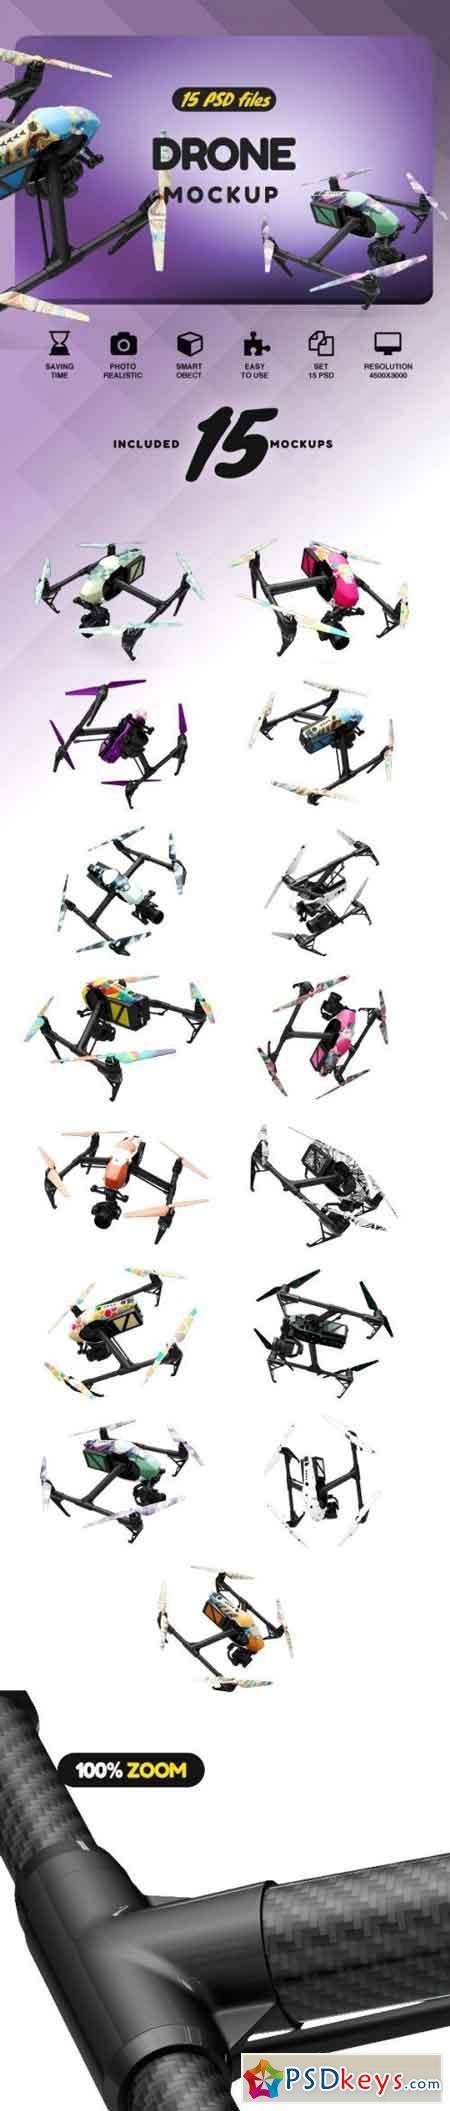 Drone Inspire 2 Mockup 2159442